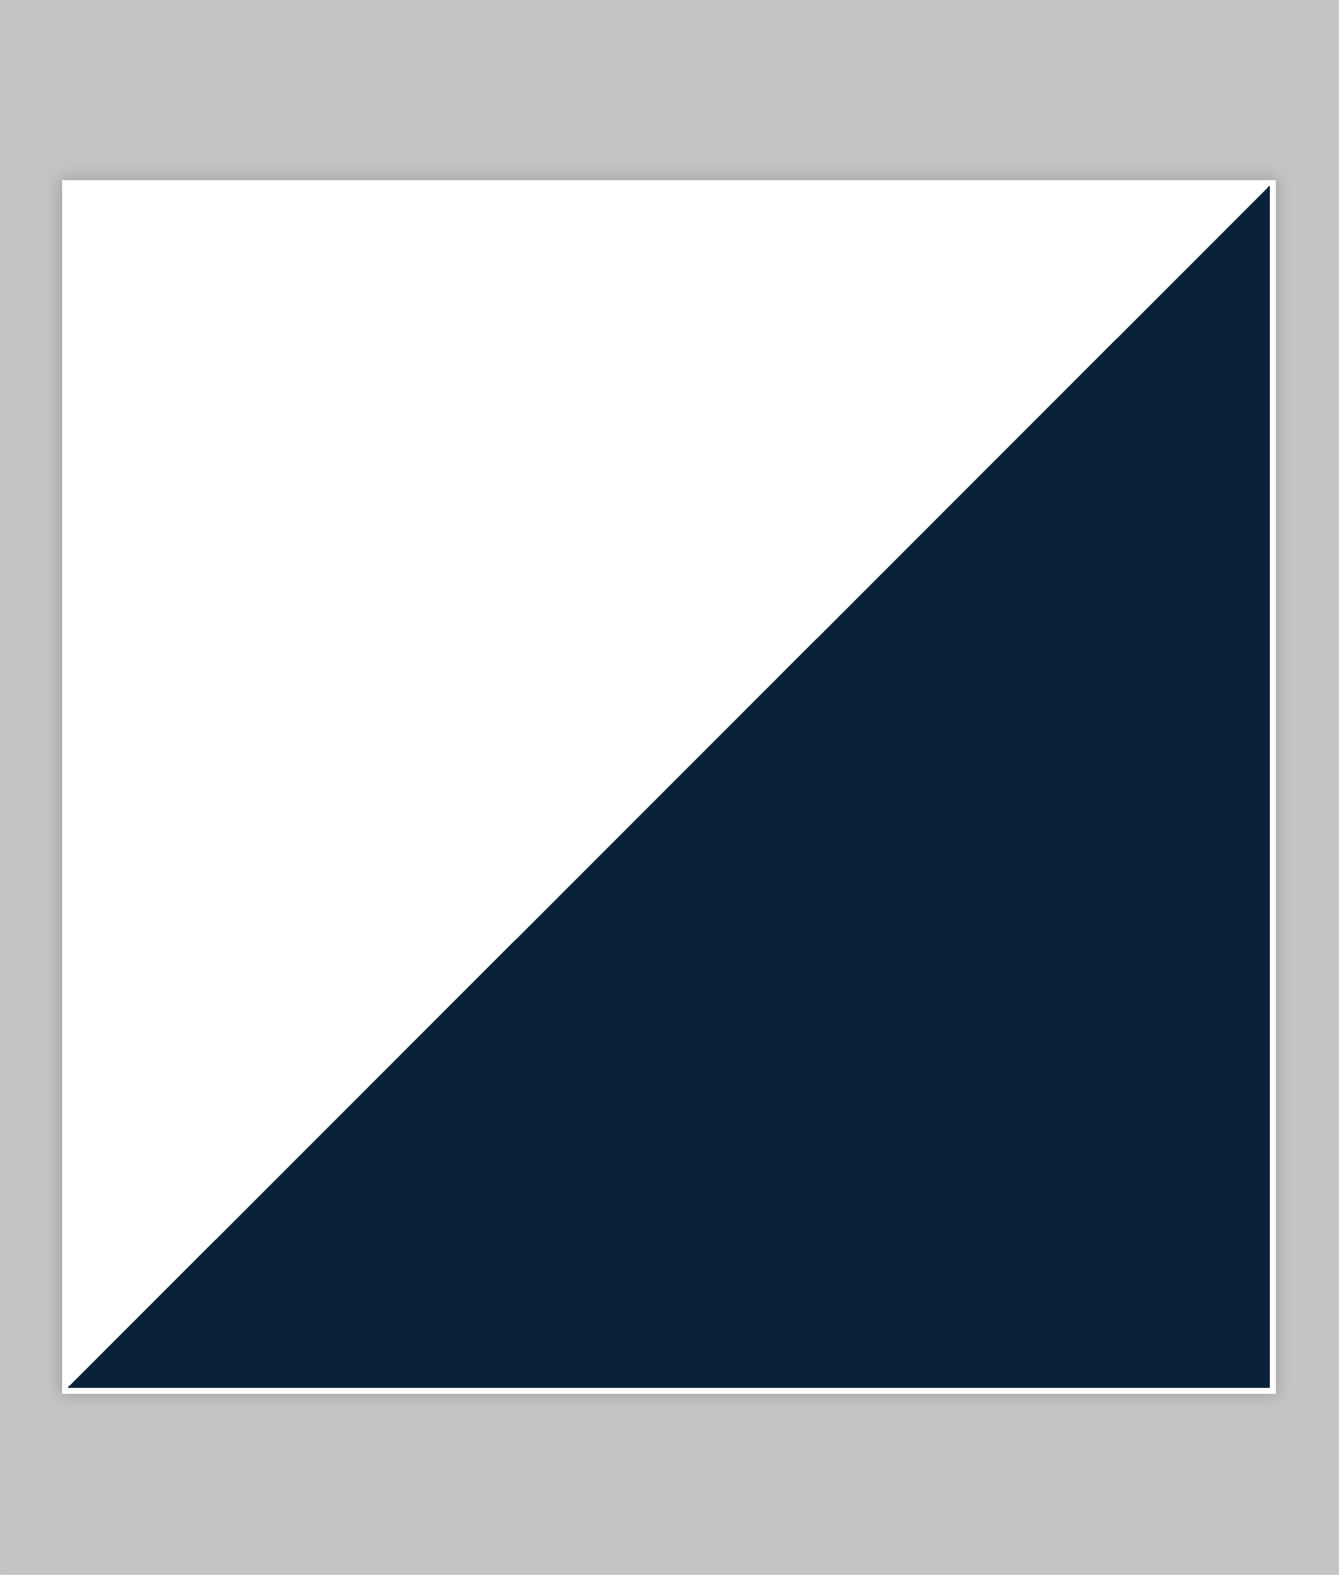 Raiz Navy Blue Ceramic Tile // Azulejo Raiz Azul Marinho // Shop ...